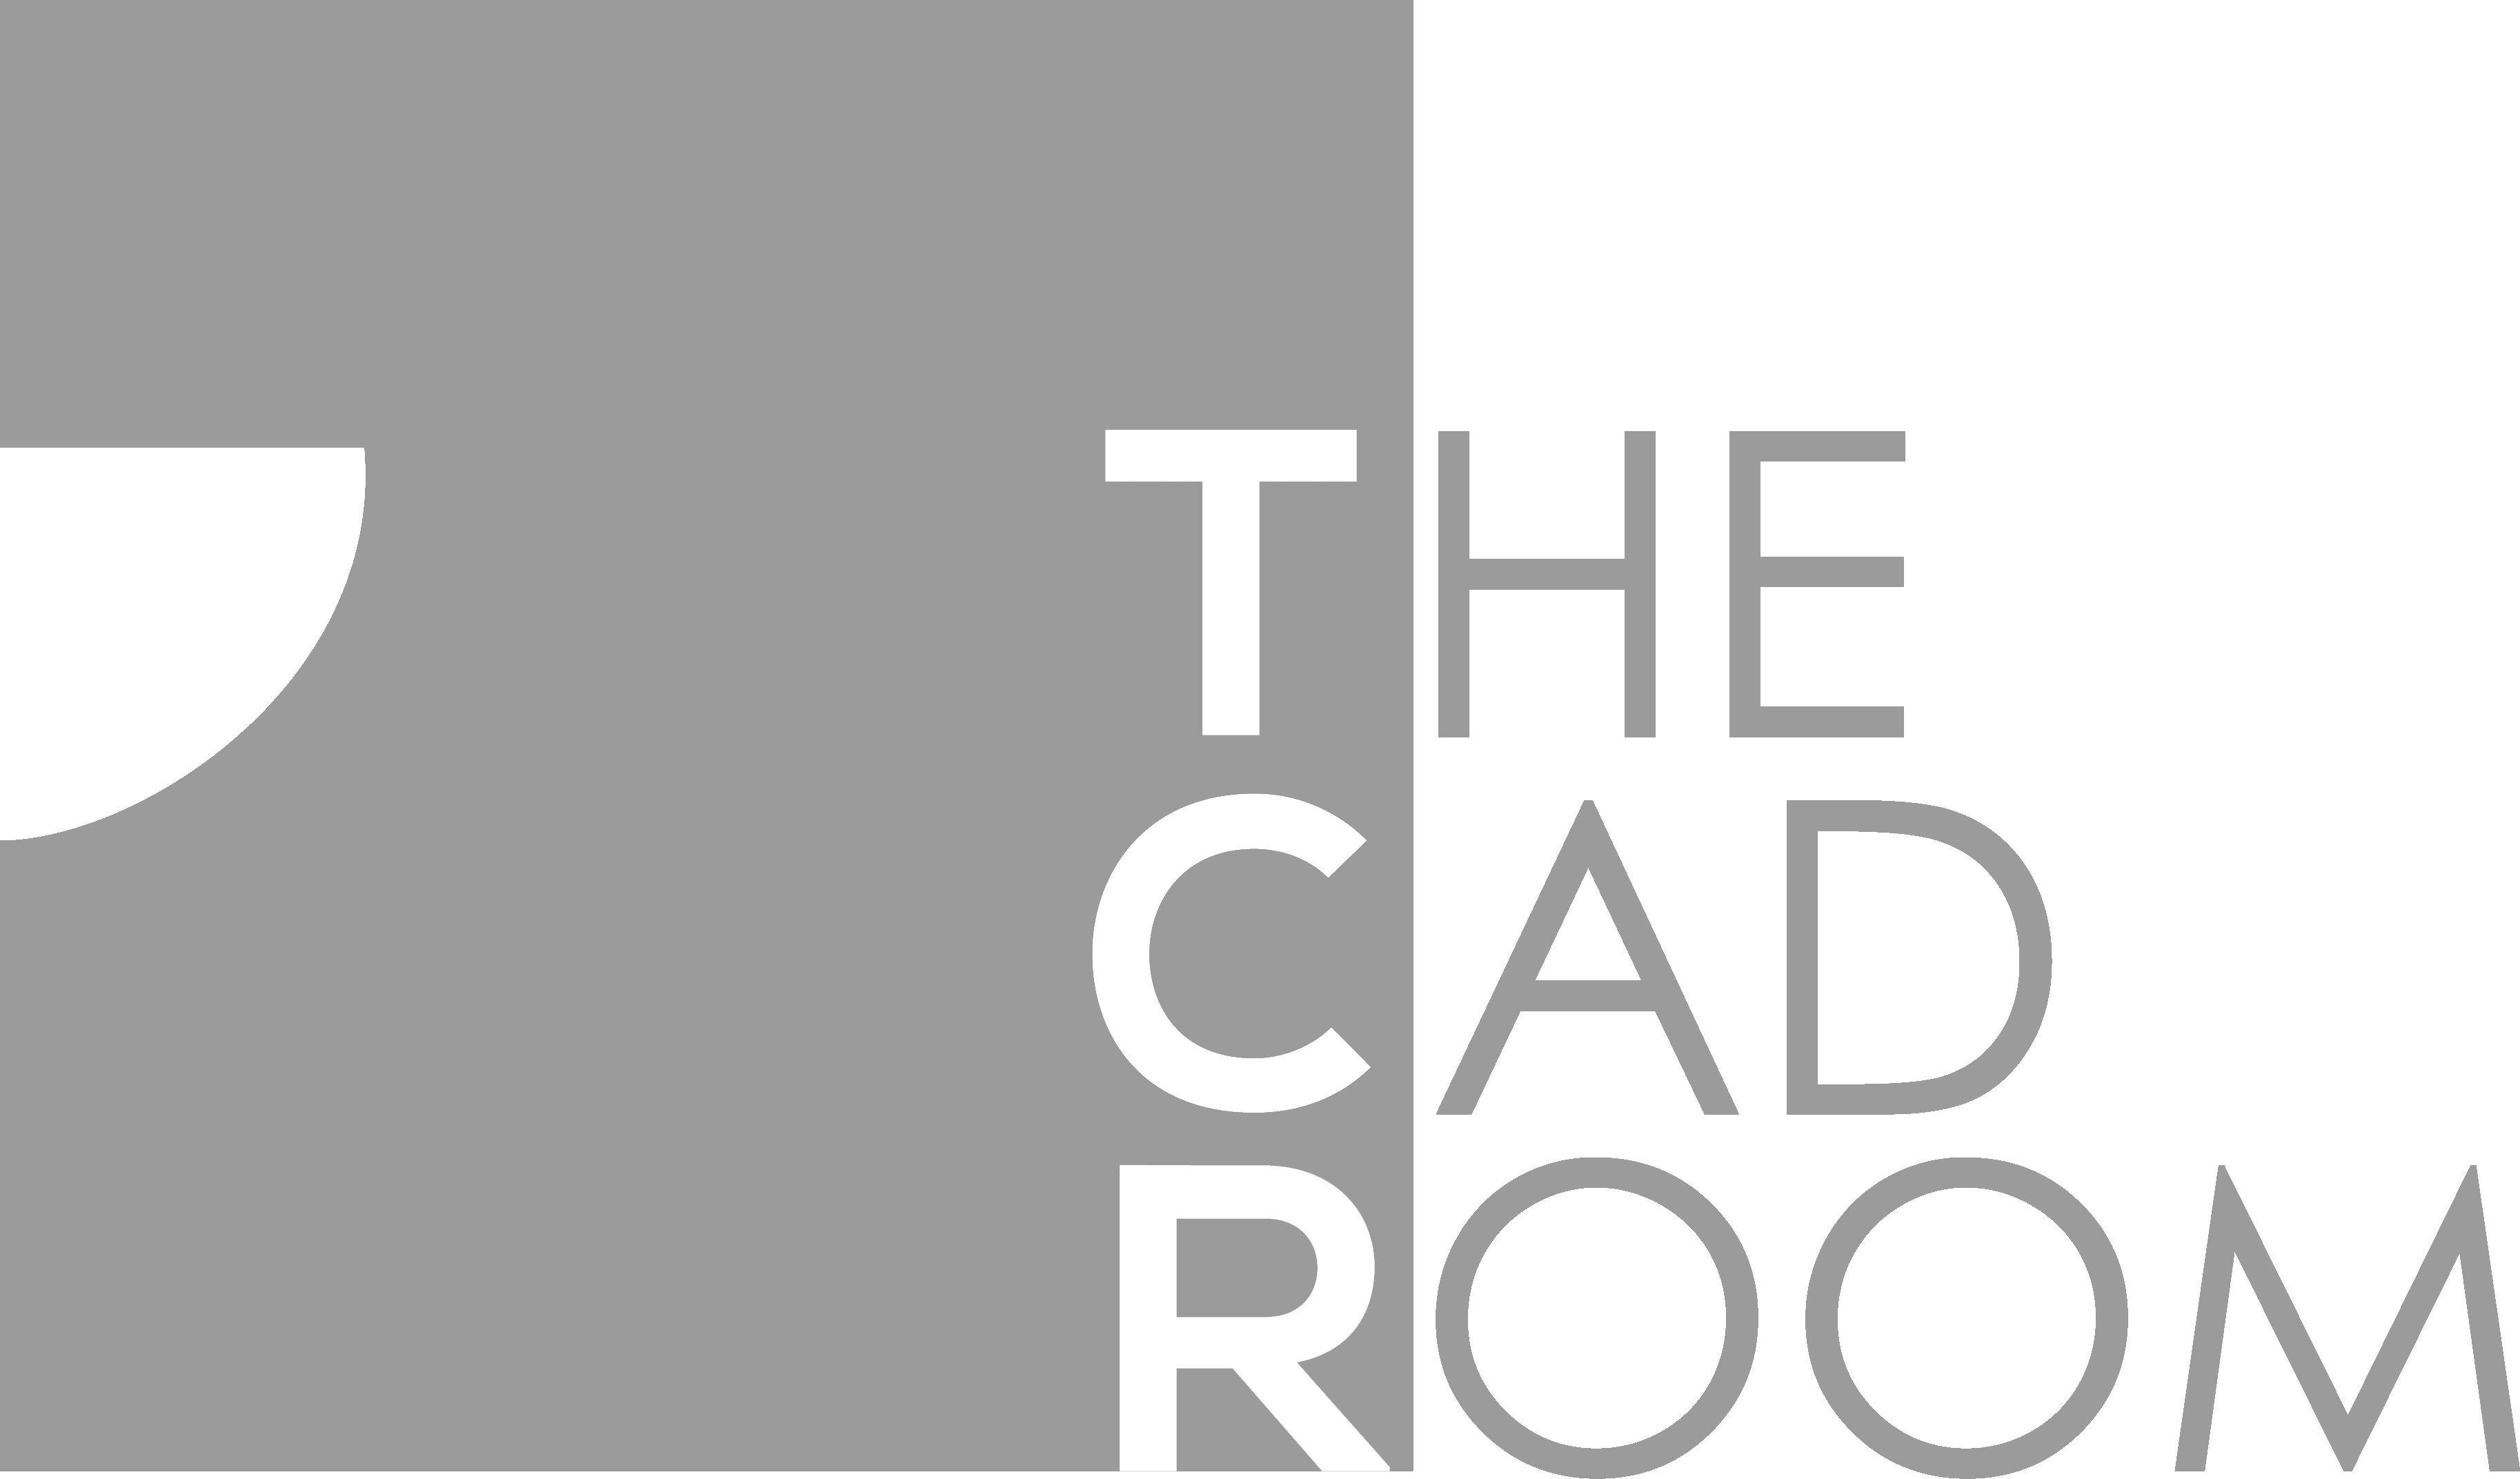 The CAD Room logo grey